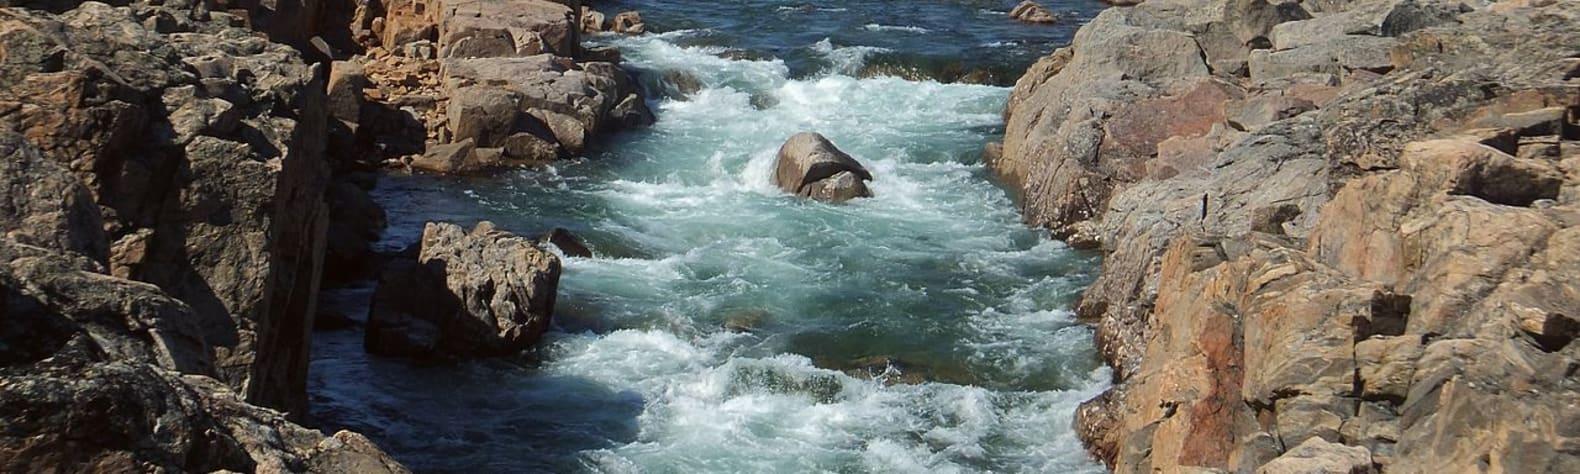 Ukkusiksalik National Park